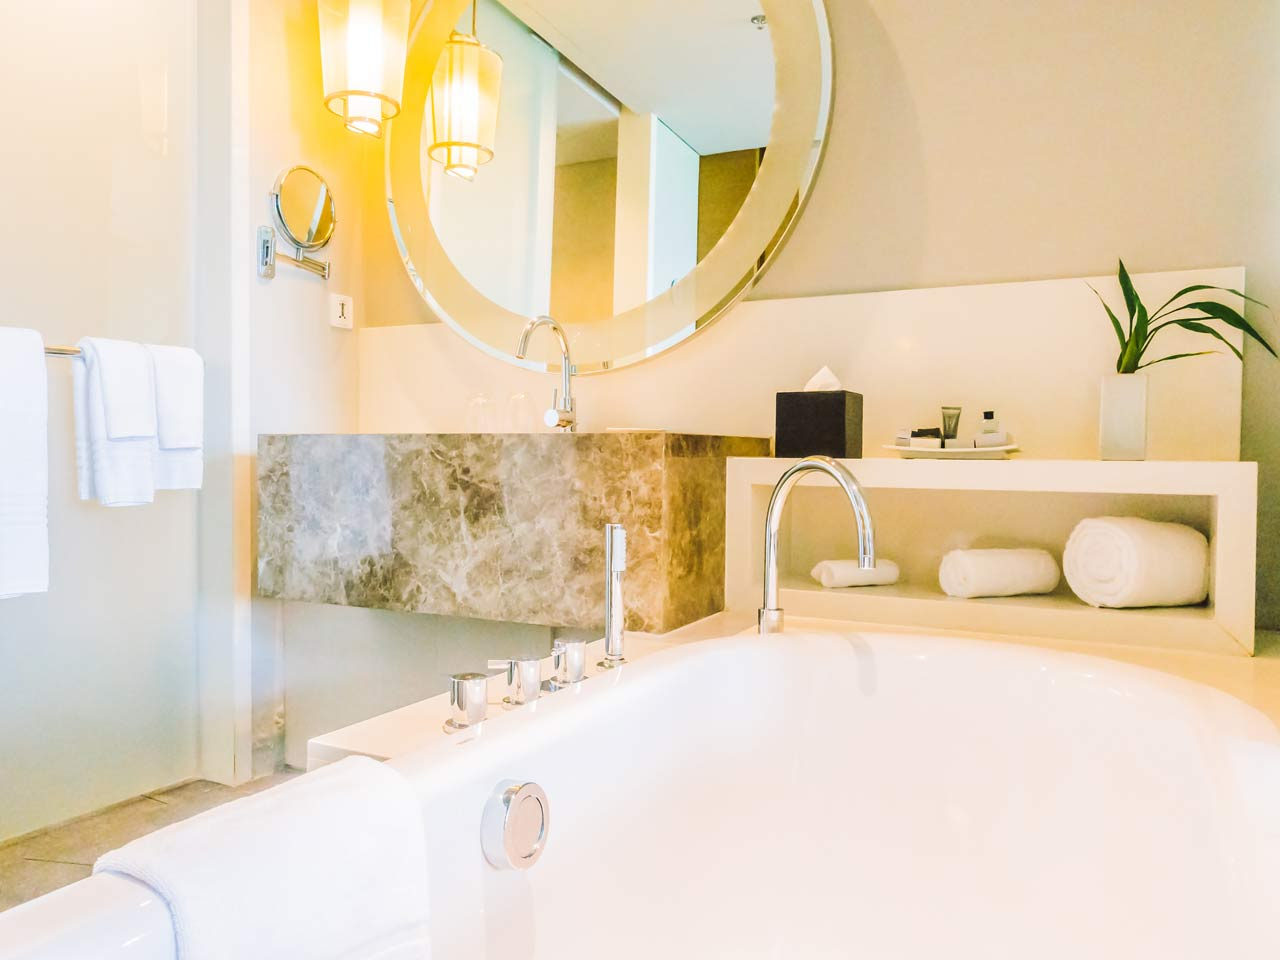 Big ideas for a small bathroom saga for Big bathroom design ideas